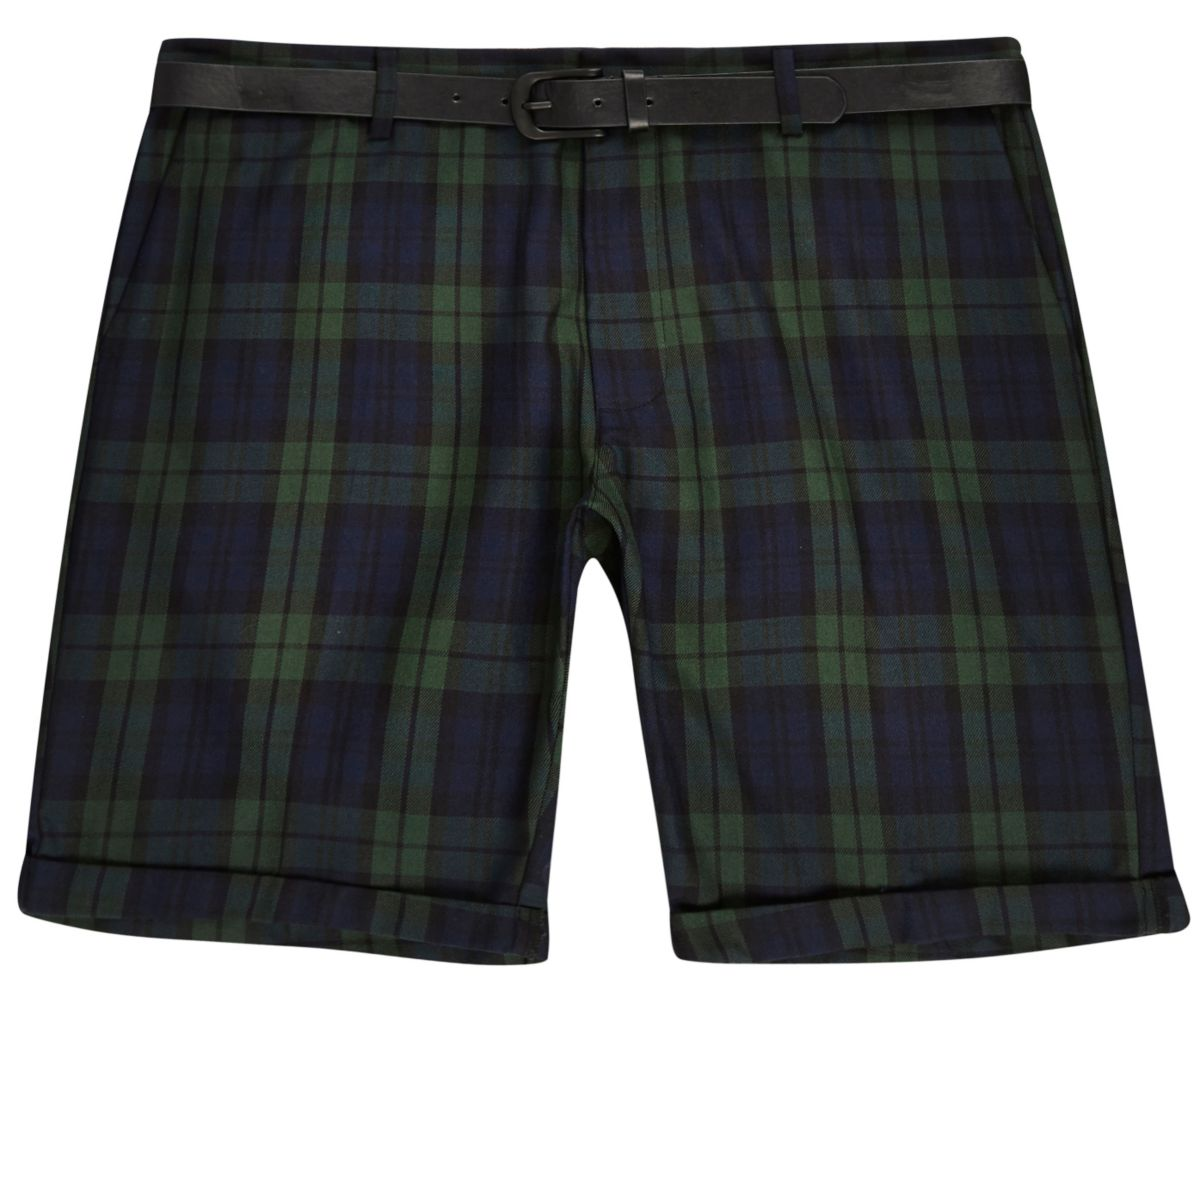 Green tartan belted shorts